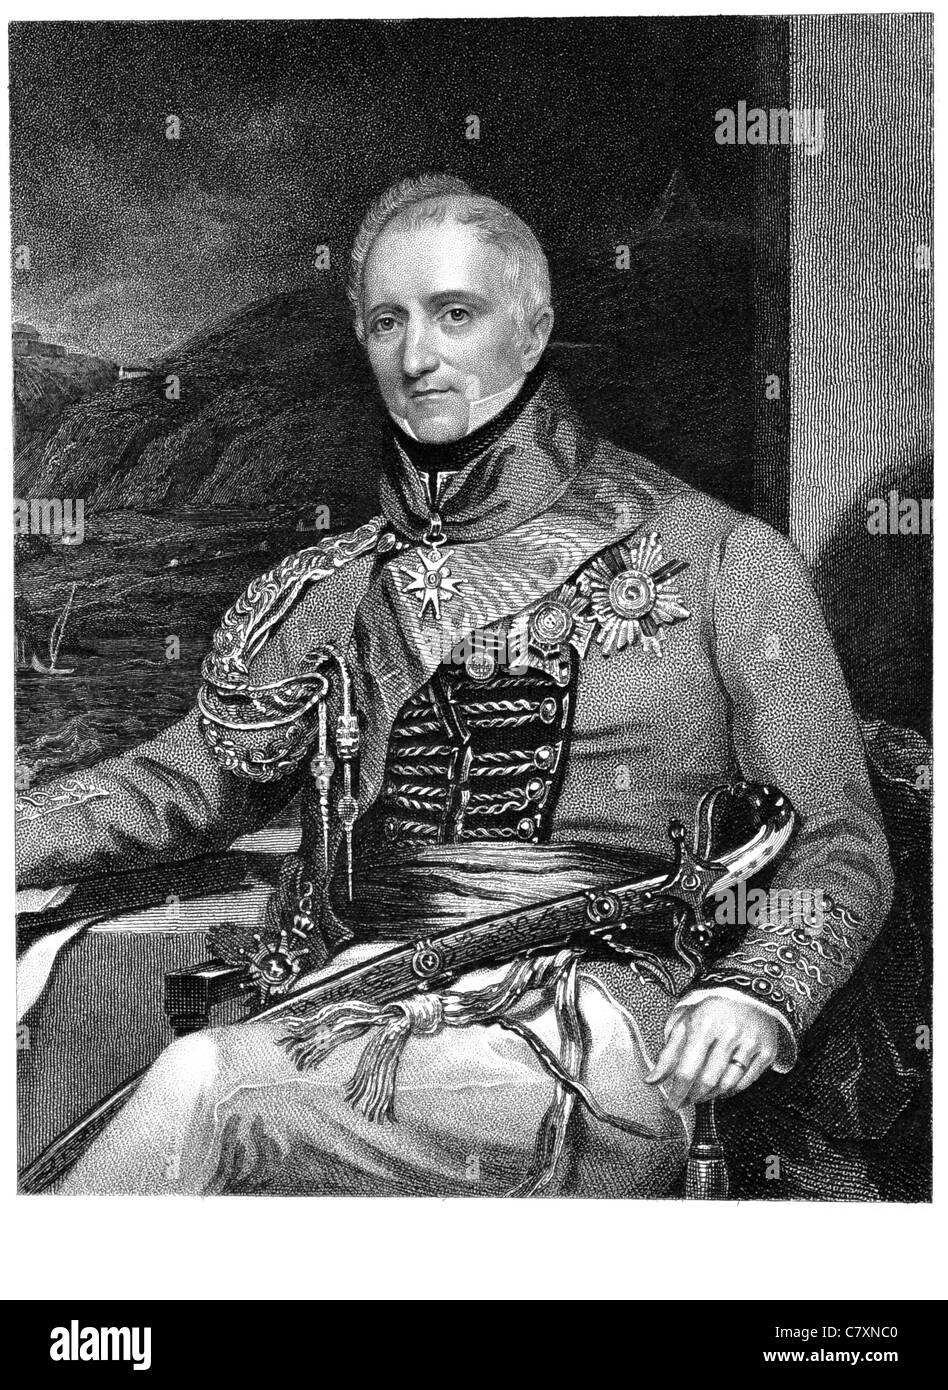 Sir Rufane Shaw Donkin GCH KCB 1773 1841 British army officer Napoleonic era Member of Parliament Battle of Talavera - Stock Image